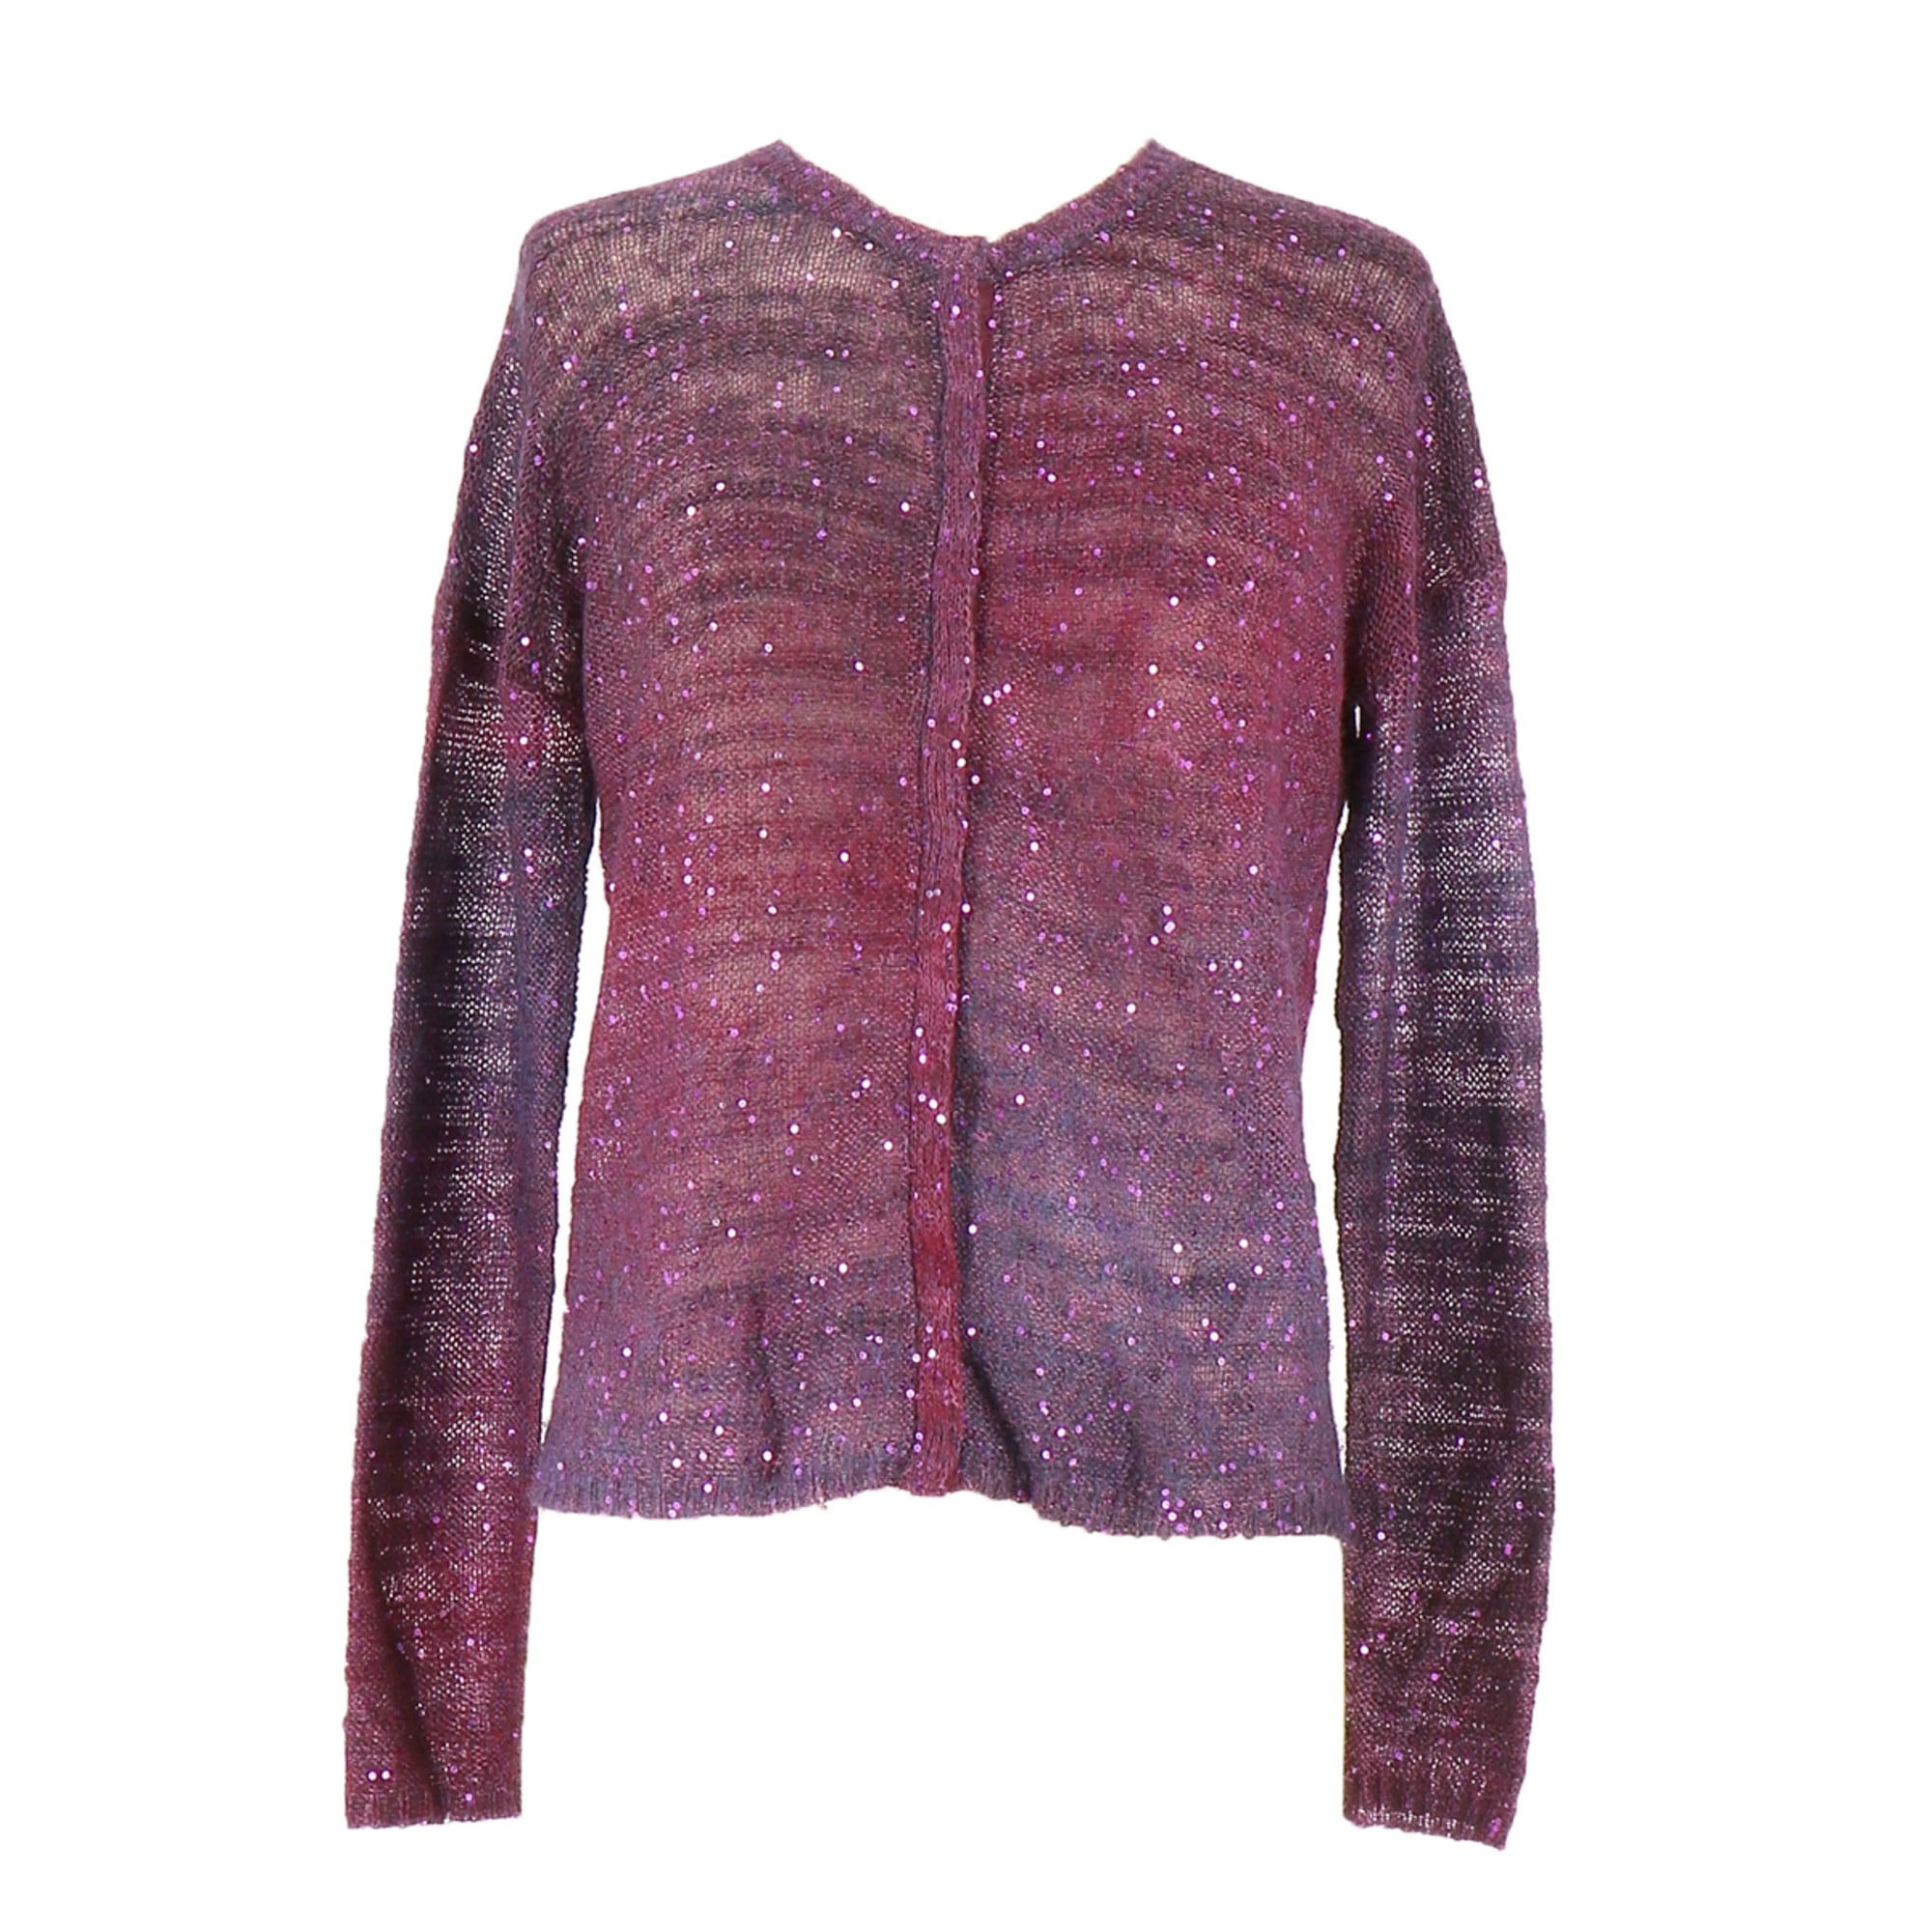 Pea Coat BERENICE Purple, mauve, lavender